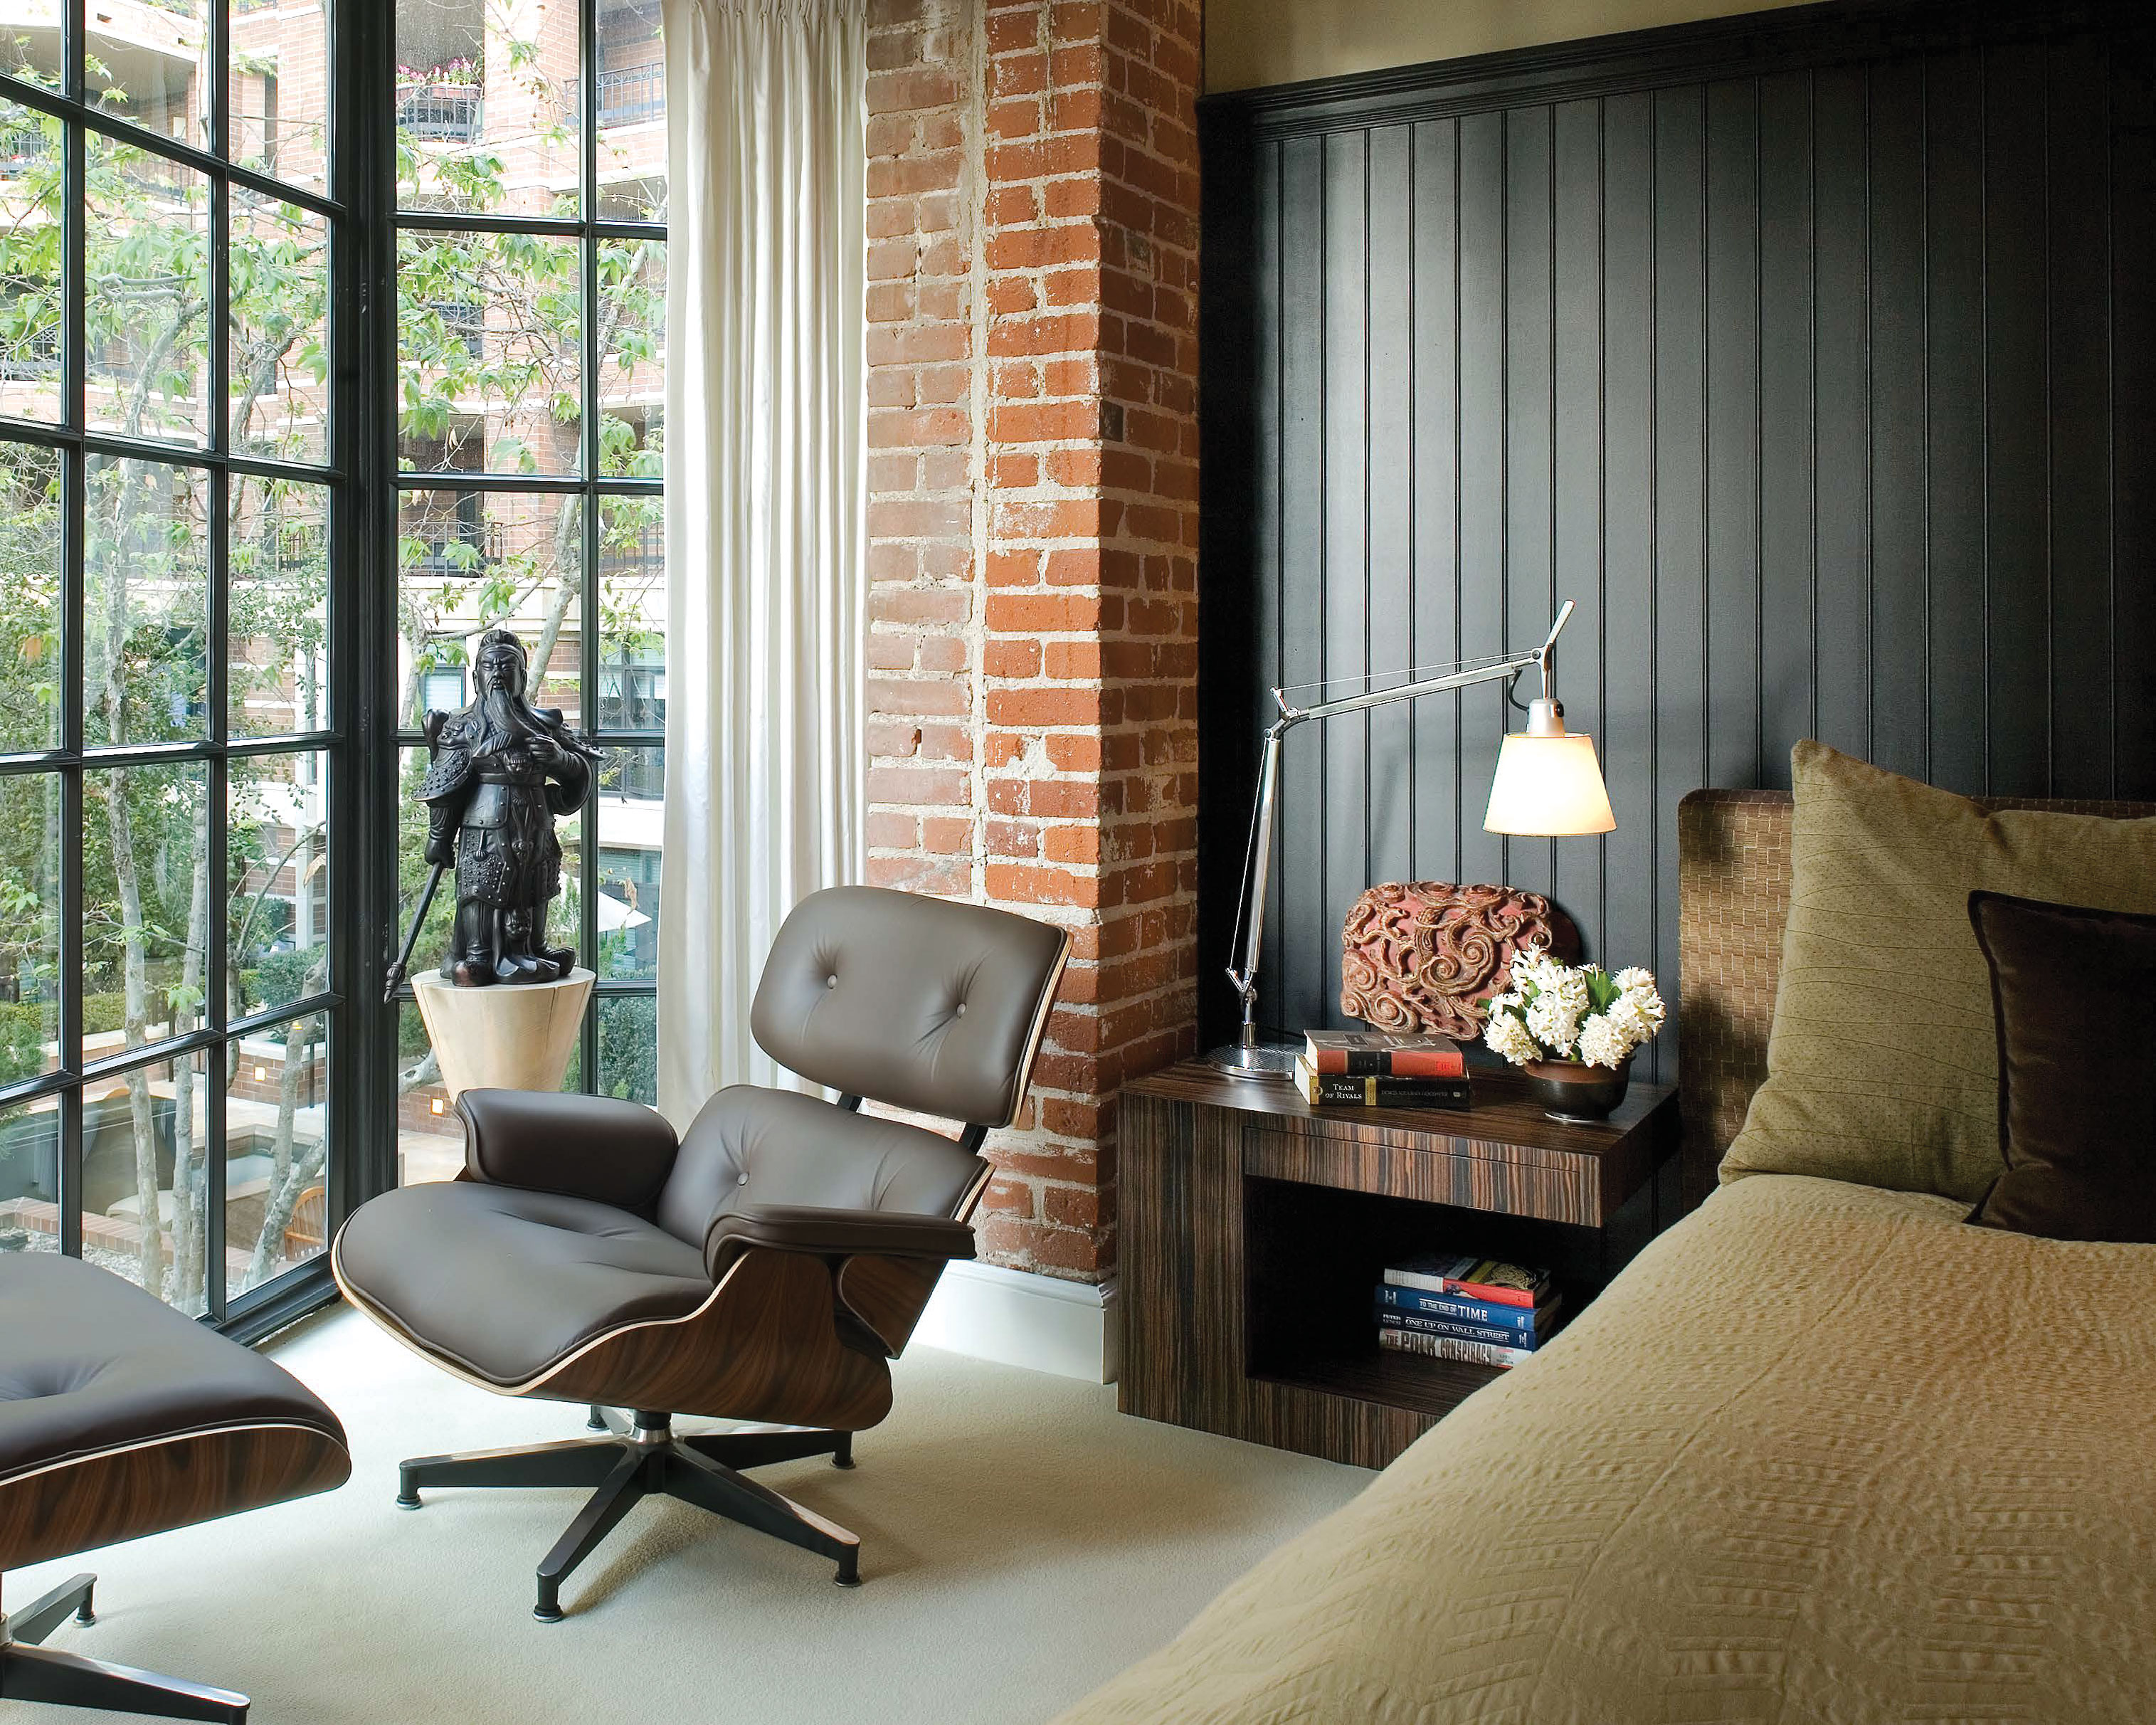 vintage decor antique furniture midcentury modern asian decor